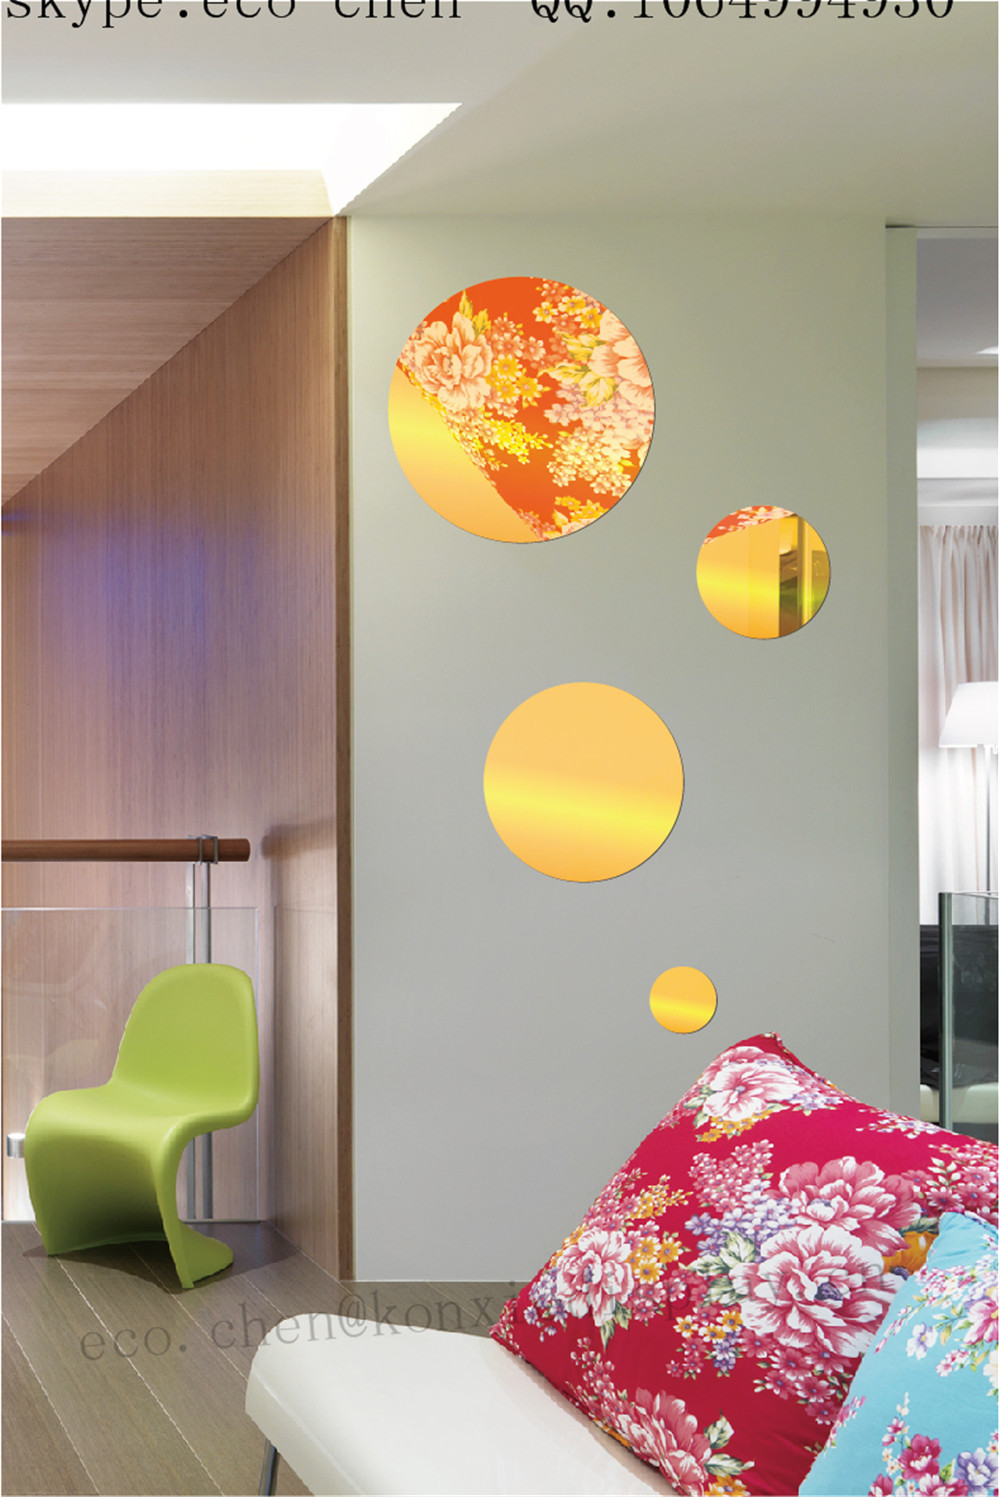 Acryl kreise dekoration wand h ngen andere h usliche dekoration produkt id 60324568898 german - Dekoration wand ...